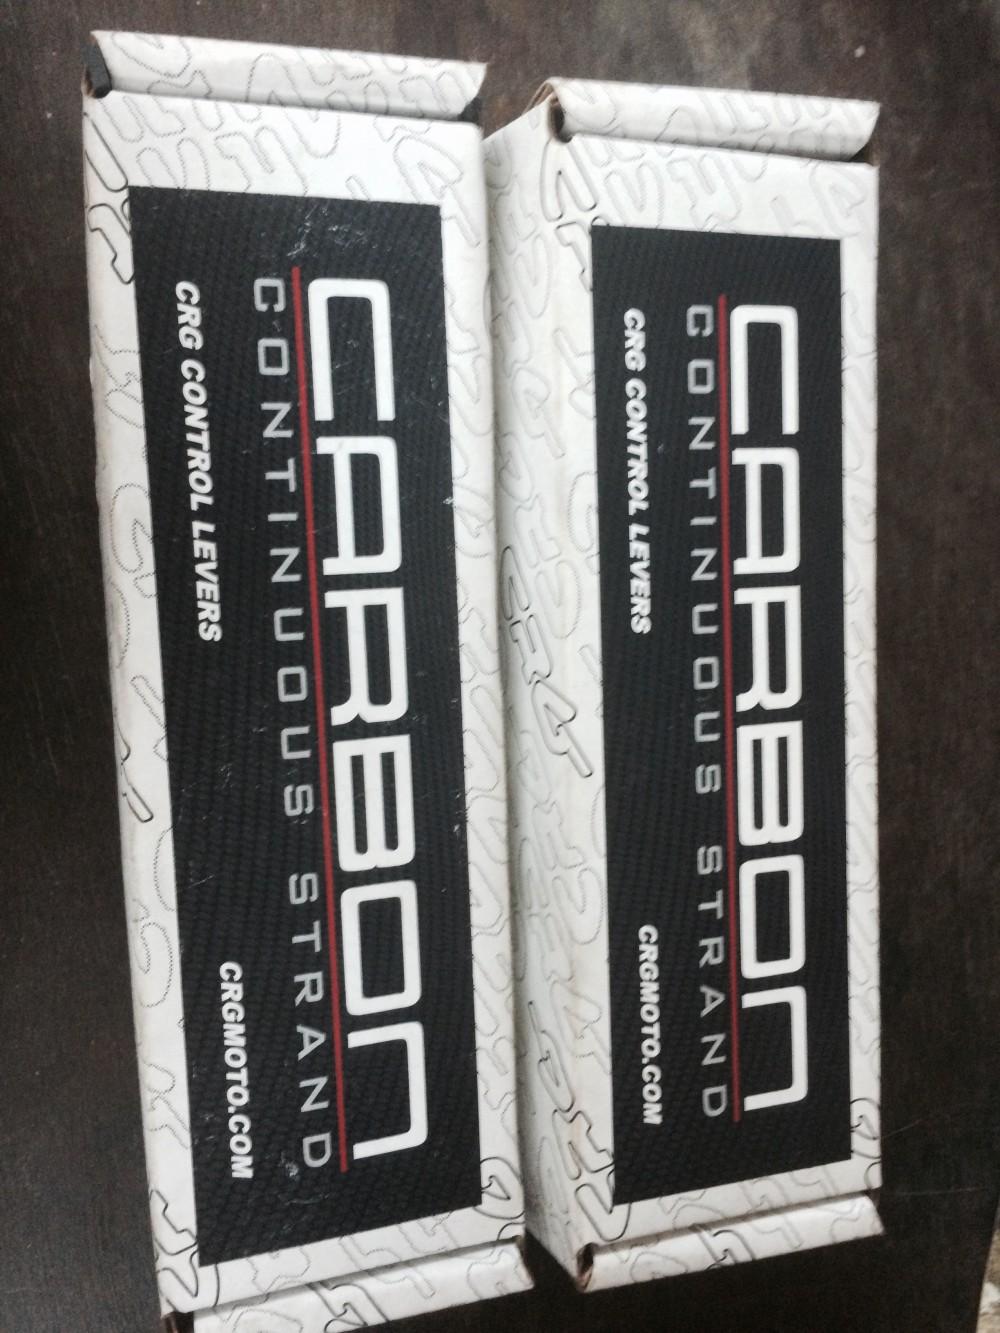 Crg carbon cho zx10z1000